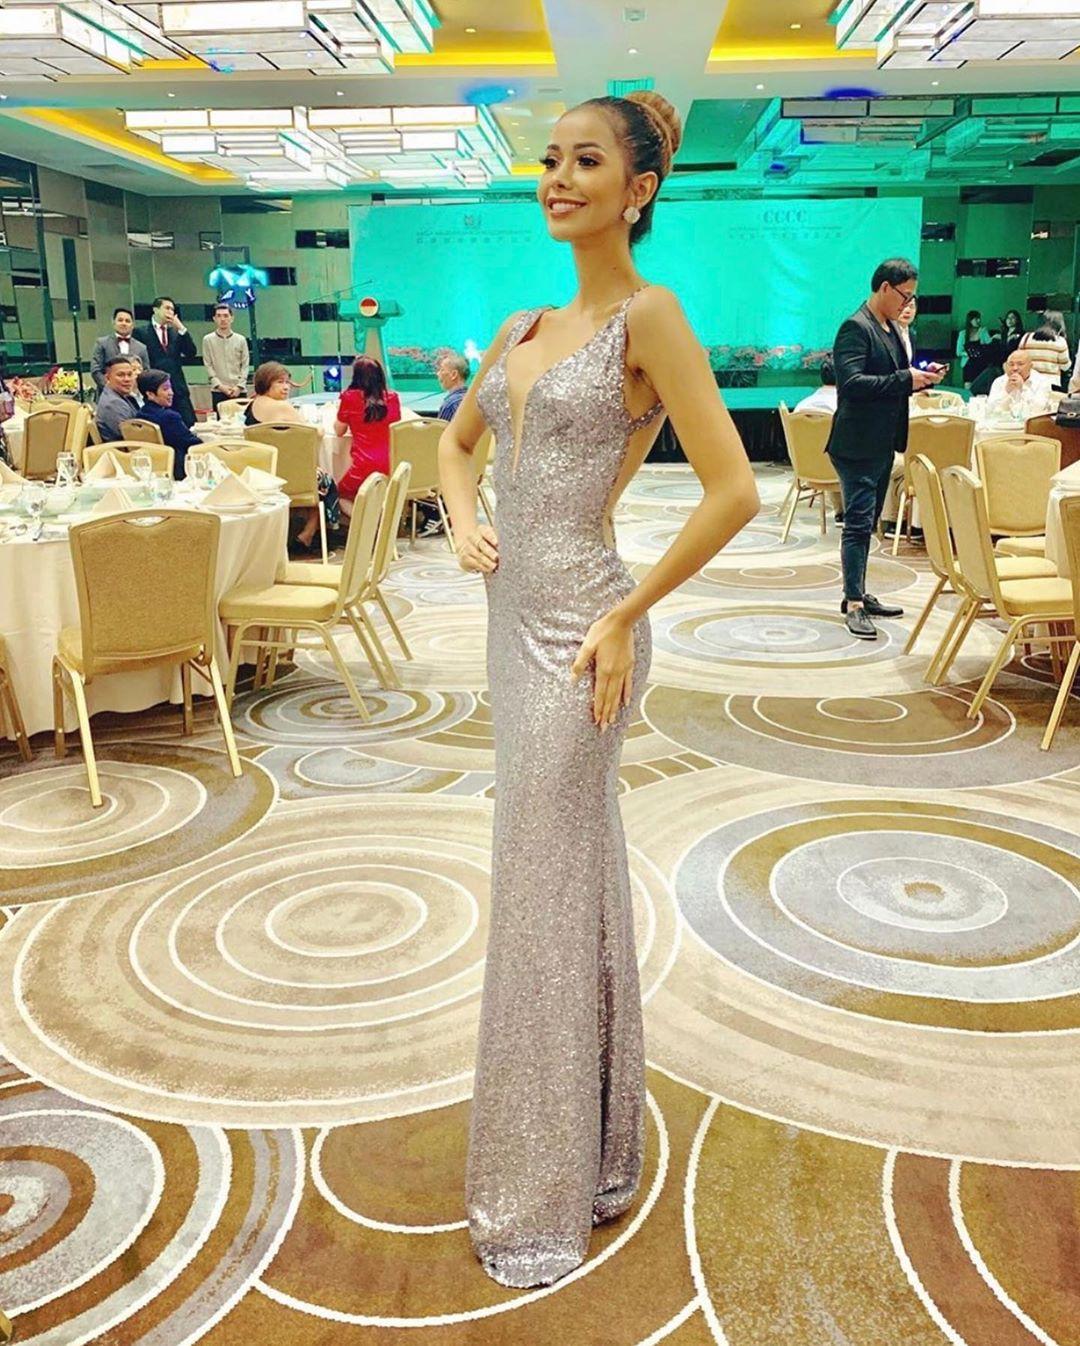 alejandra rodriguez osorio, miss asia pacific colombia 2019. - Página 2 70222910